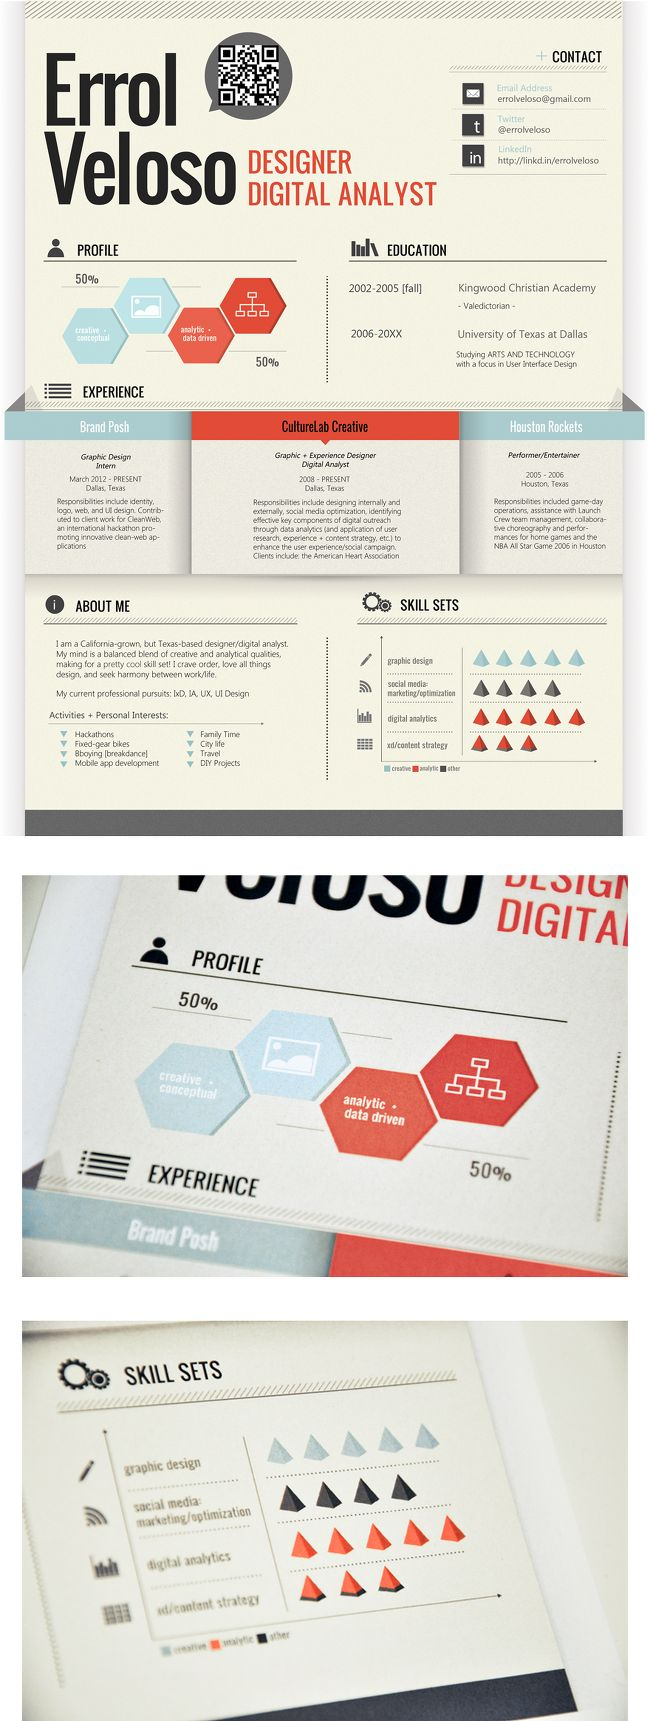 Vice Versa design studio :: [해외 인포그래픽 사례] 딱딱한 이력서는 그만! 인포그래픽 이력서 모음:)